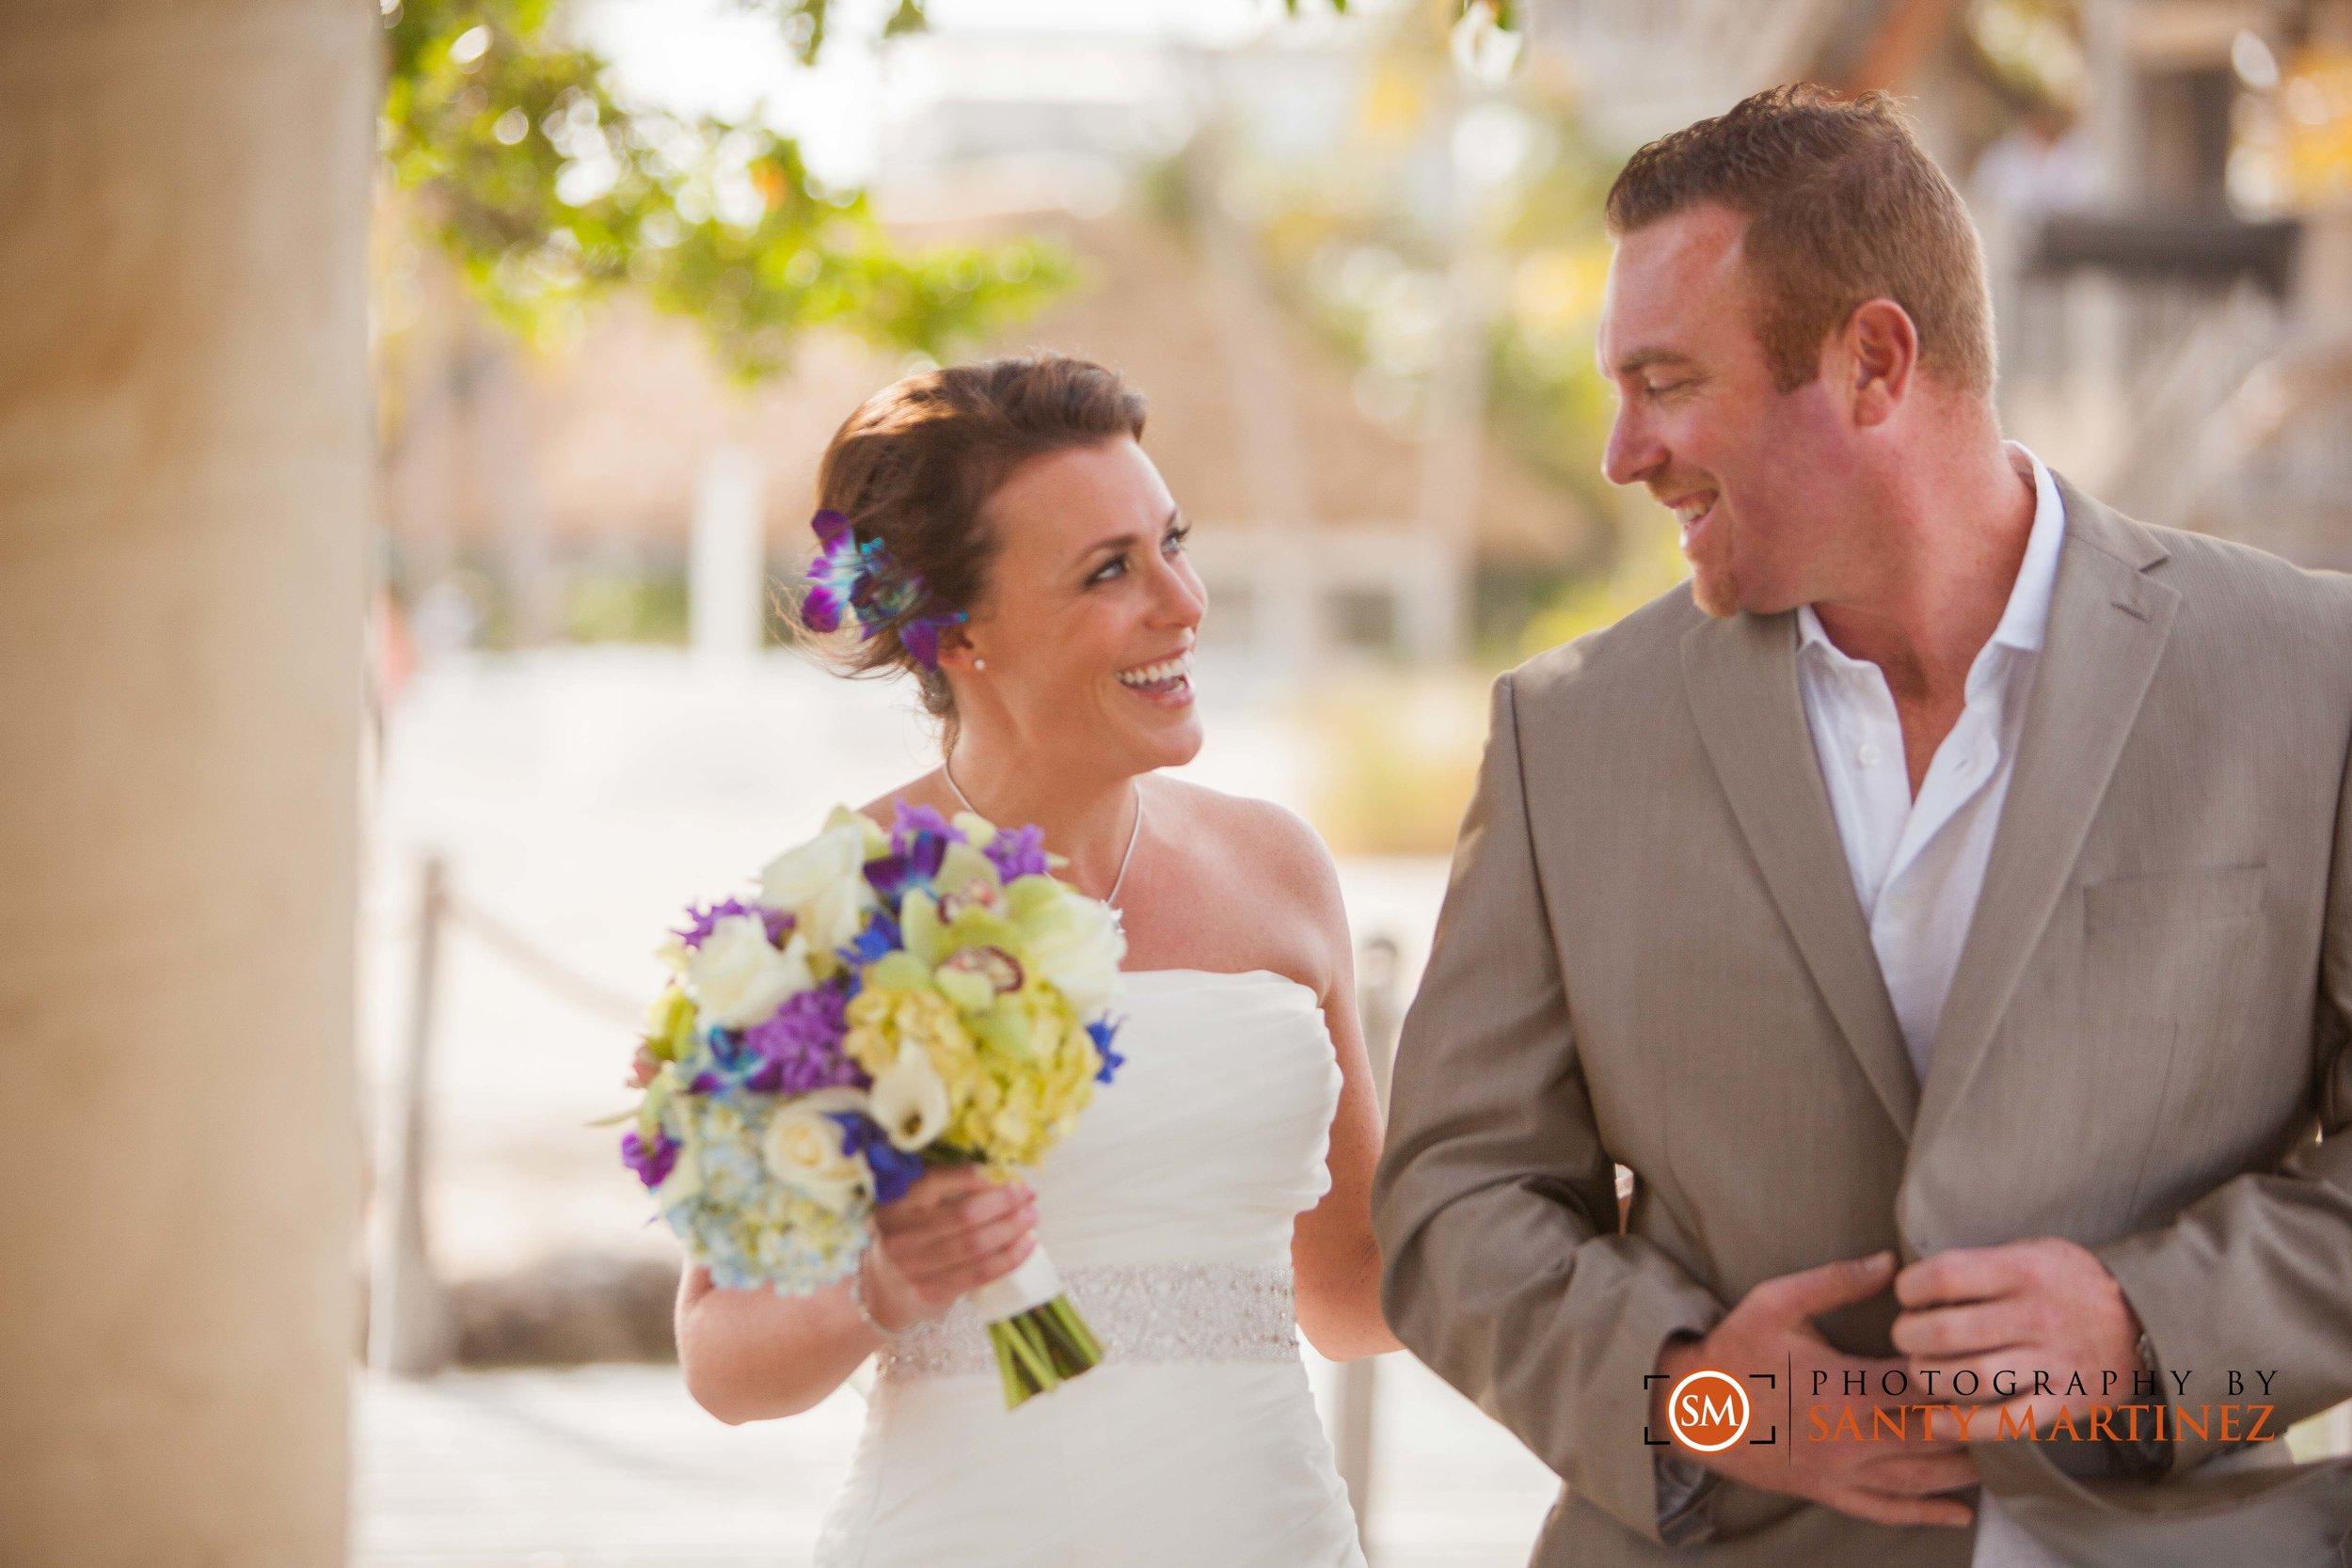 Photography by Santy Martinez - Miami Wedding Photographer-016.jpg